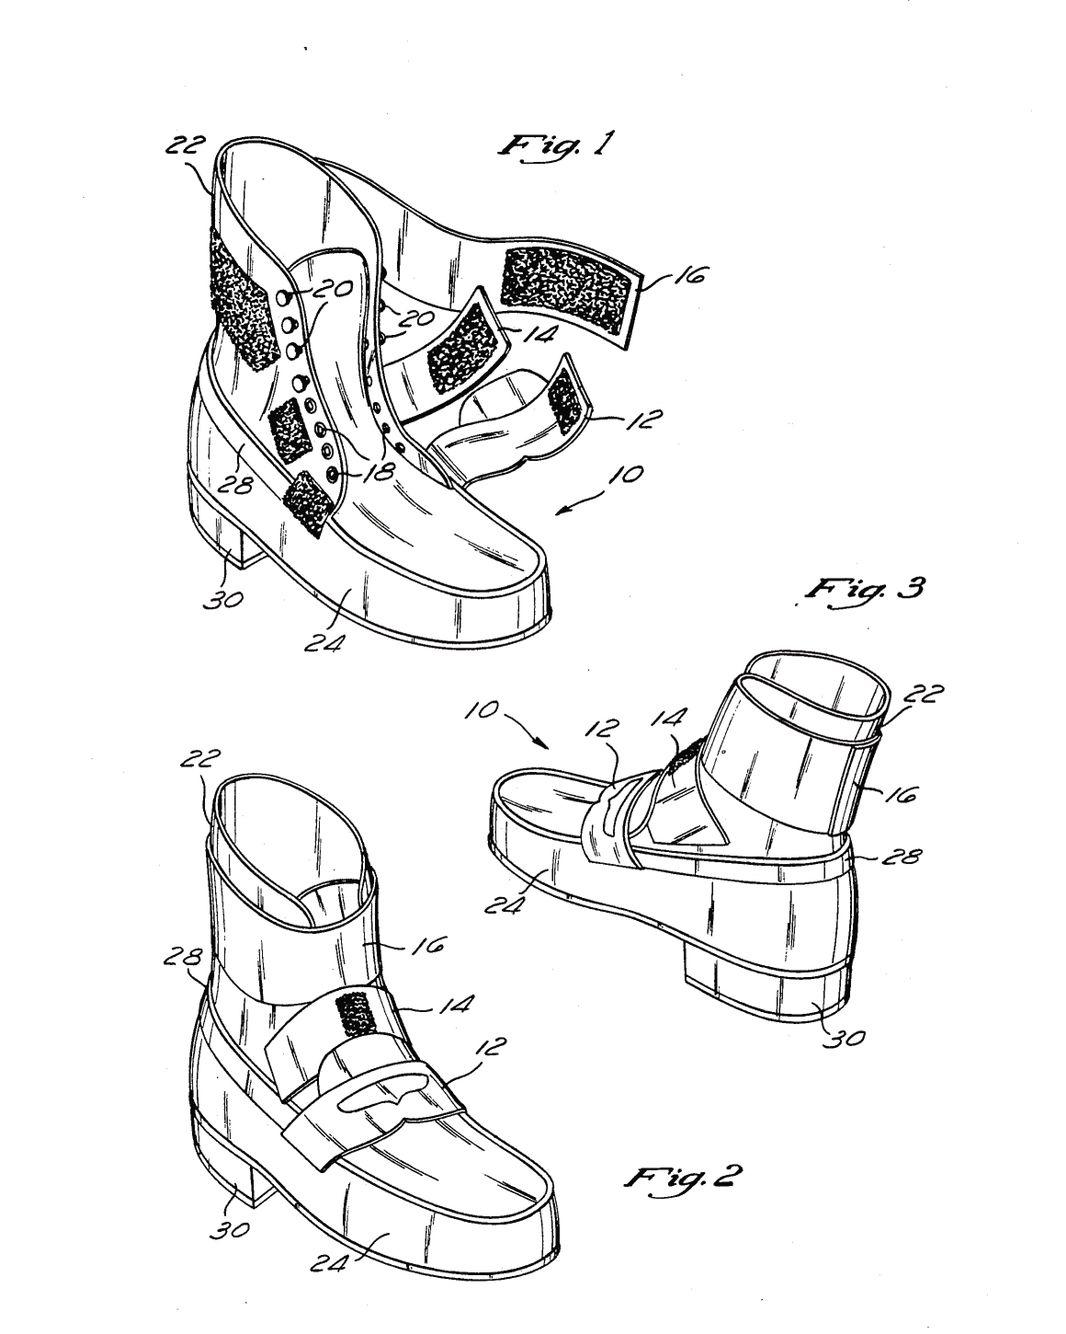 fe9037988ab 452 Michael Jackson s Anti-Gravity Lean Shoes. Believe it or not ...